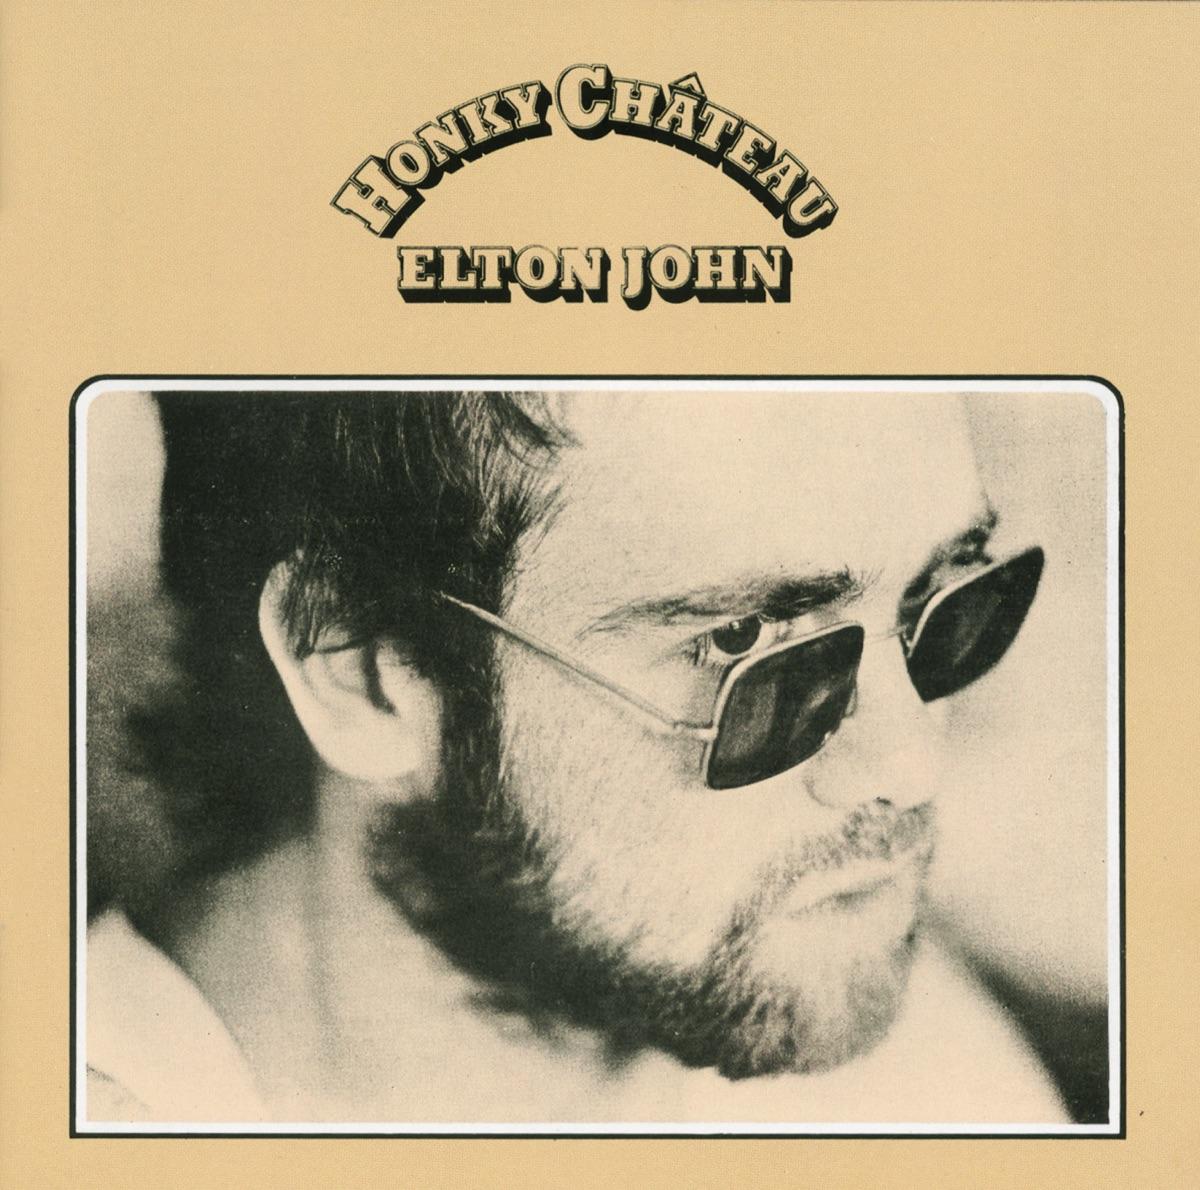 Honky Château Elton John CD cover